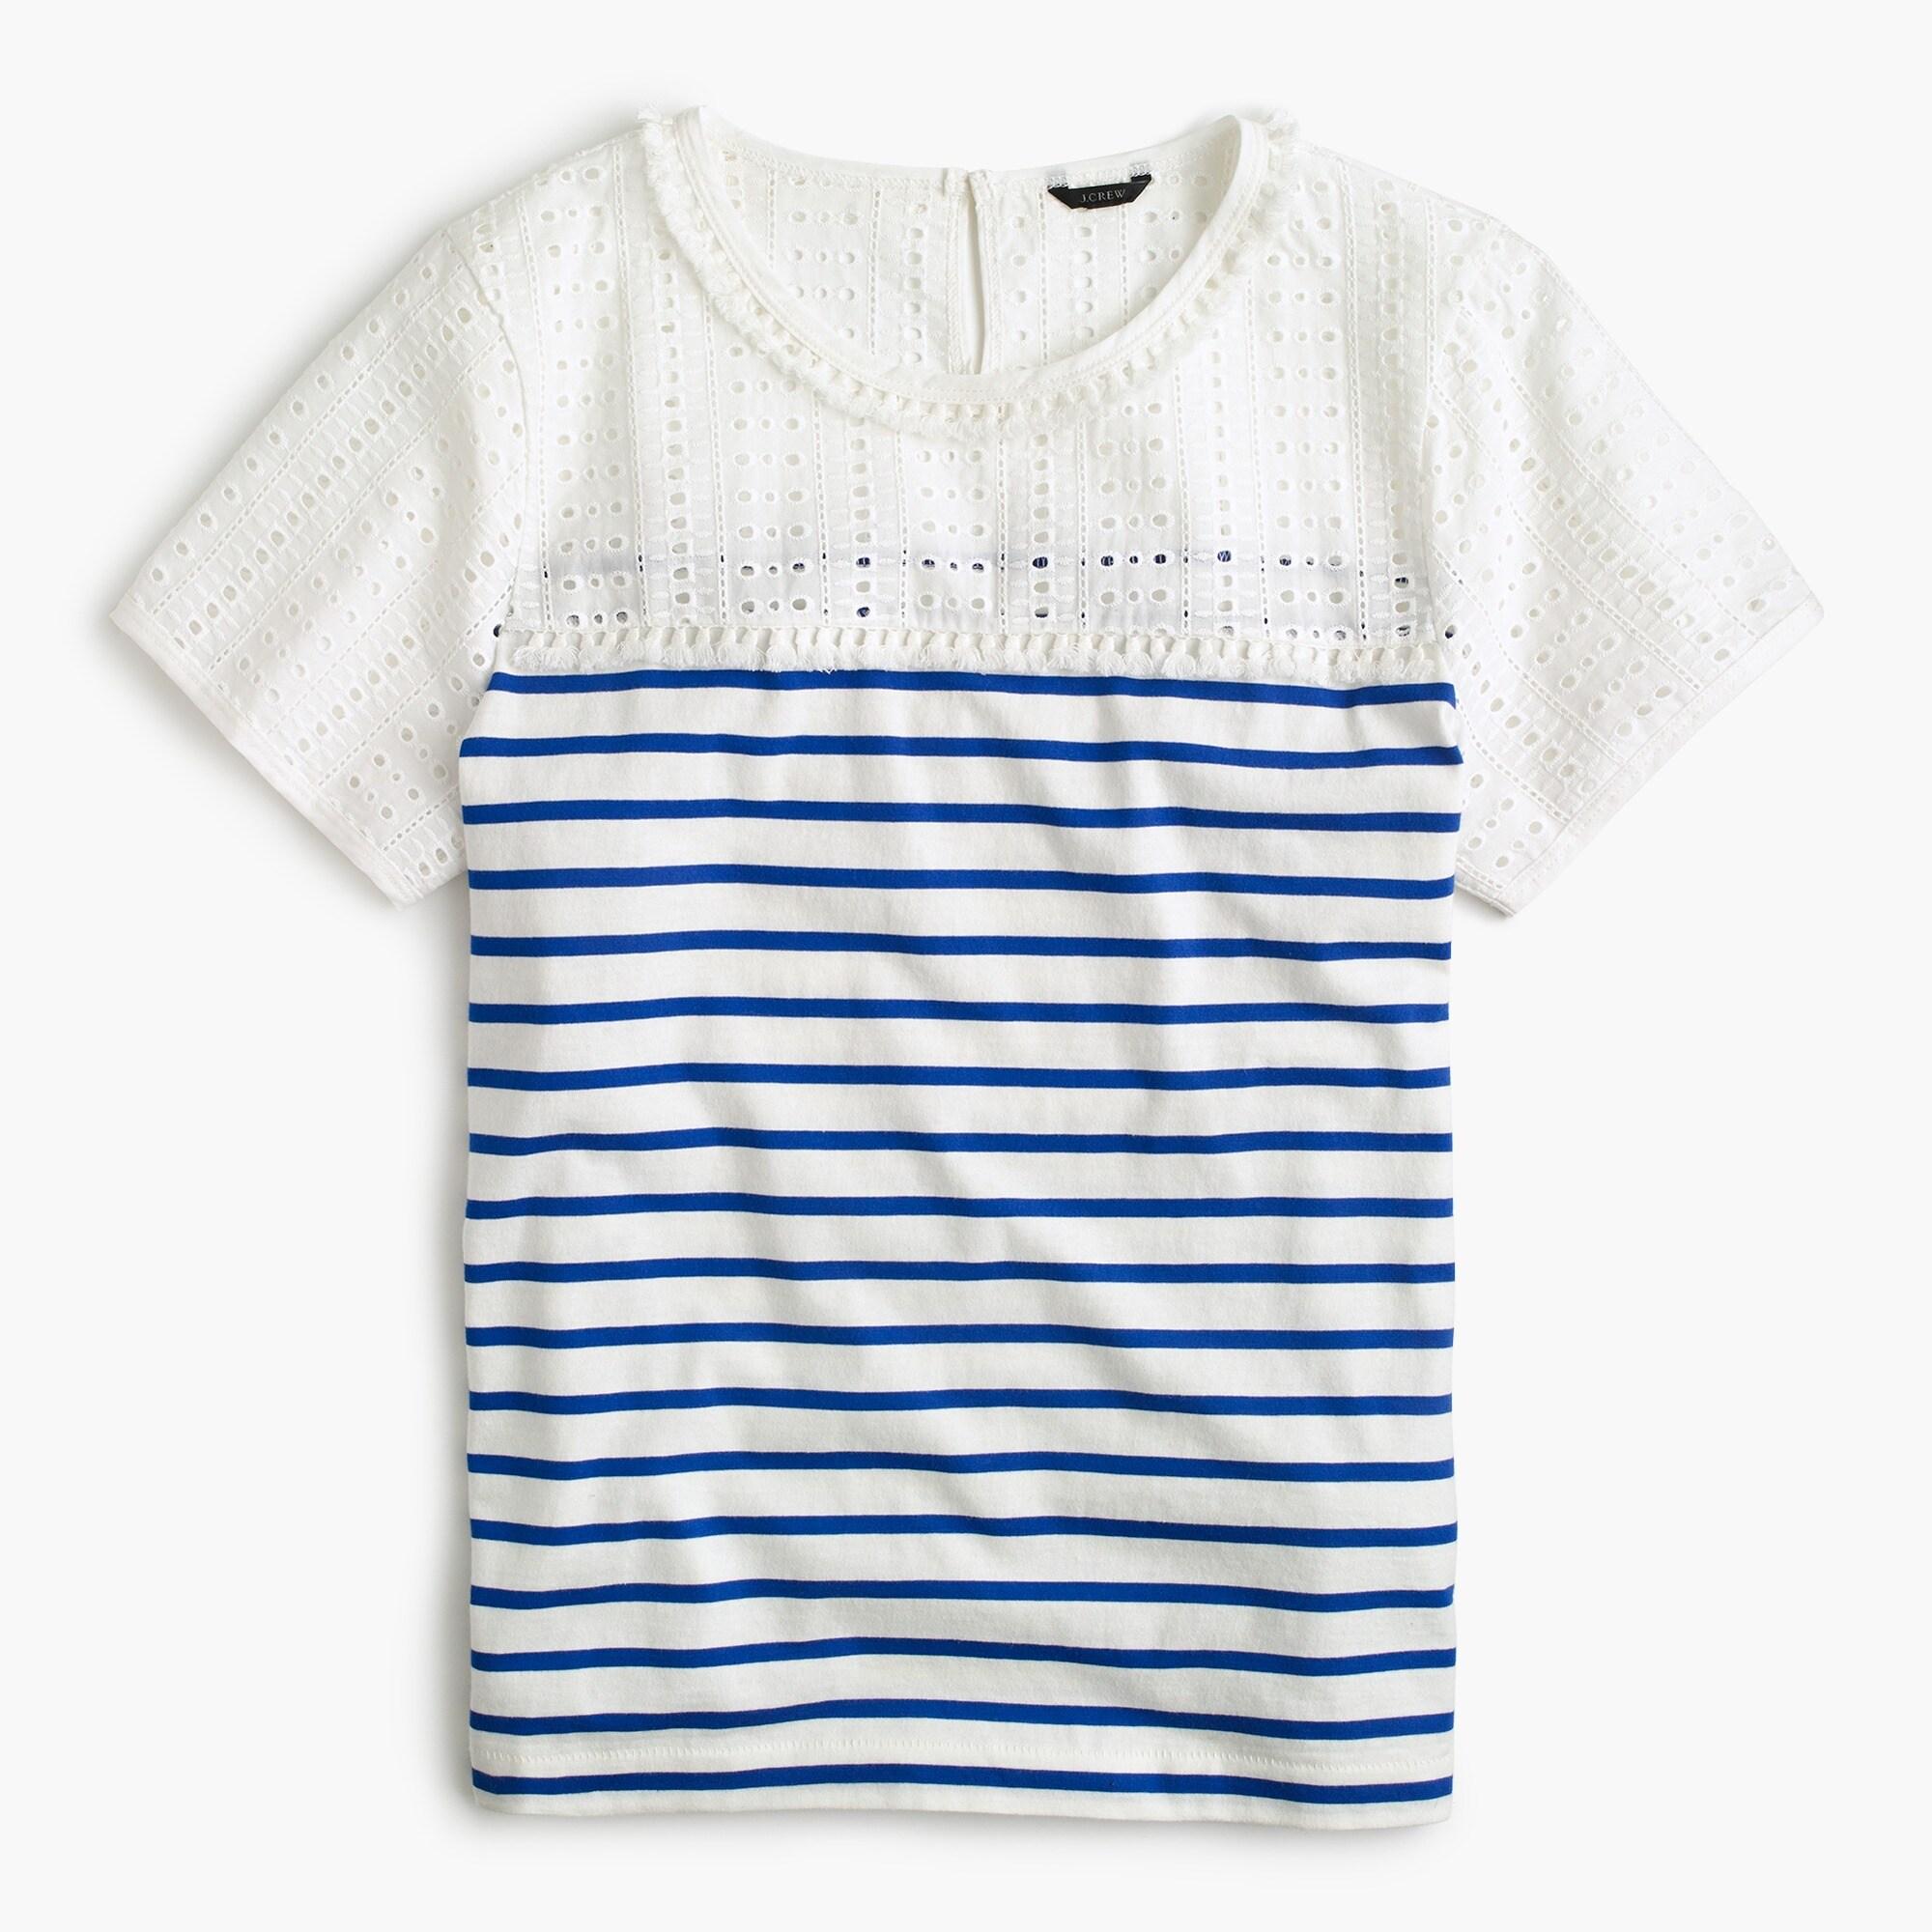 eyelet striped t-shirt : women short sleeve